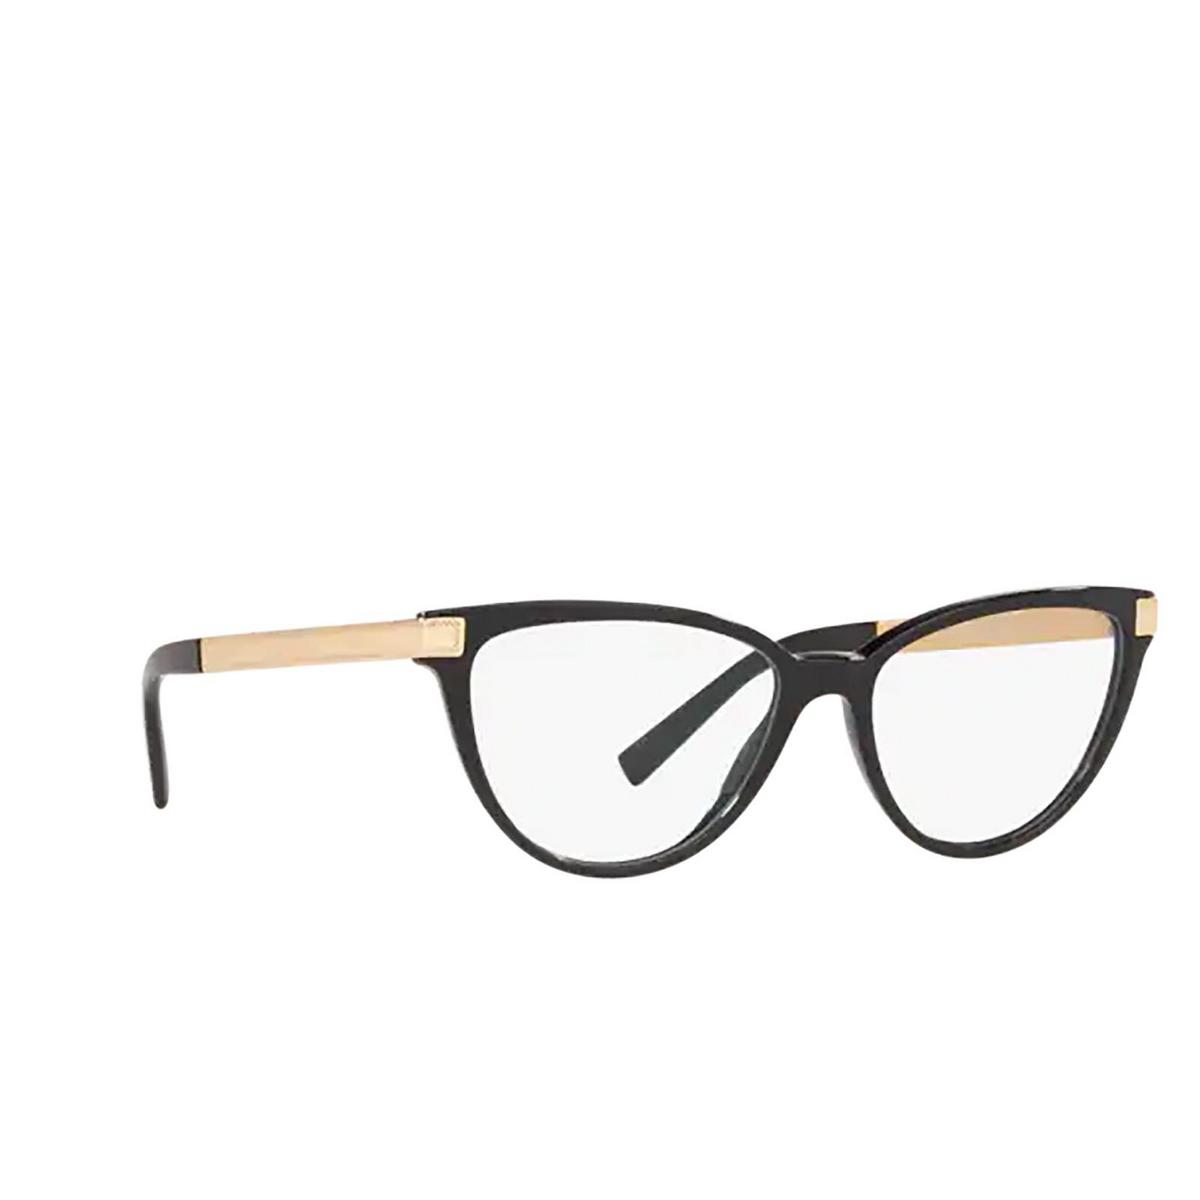 Versace® Cat-eye Eyeglasses: VE3271 color Black GB1 - three-quarters view.